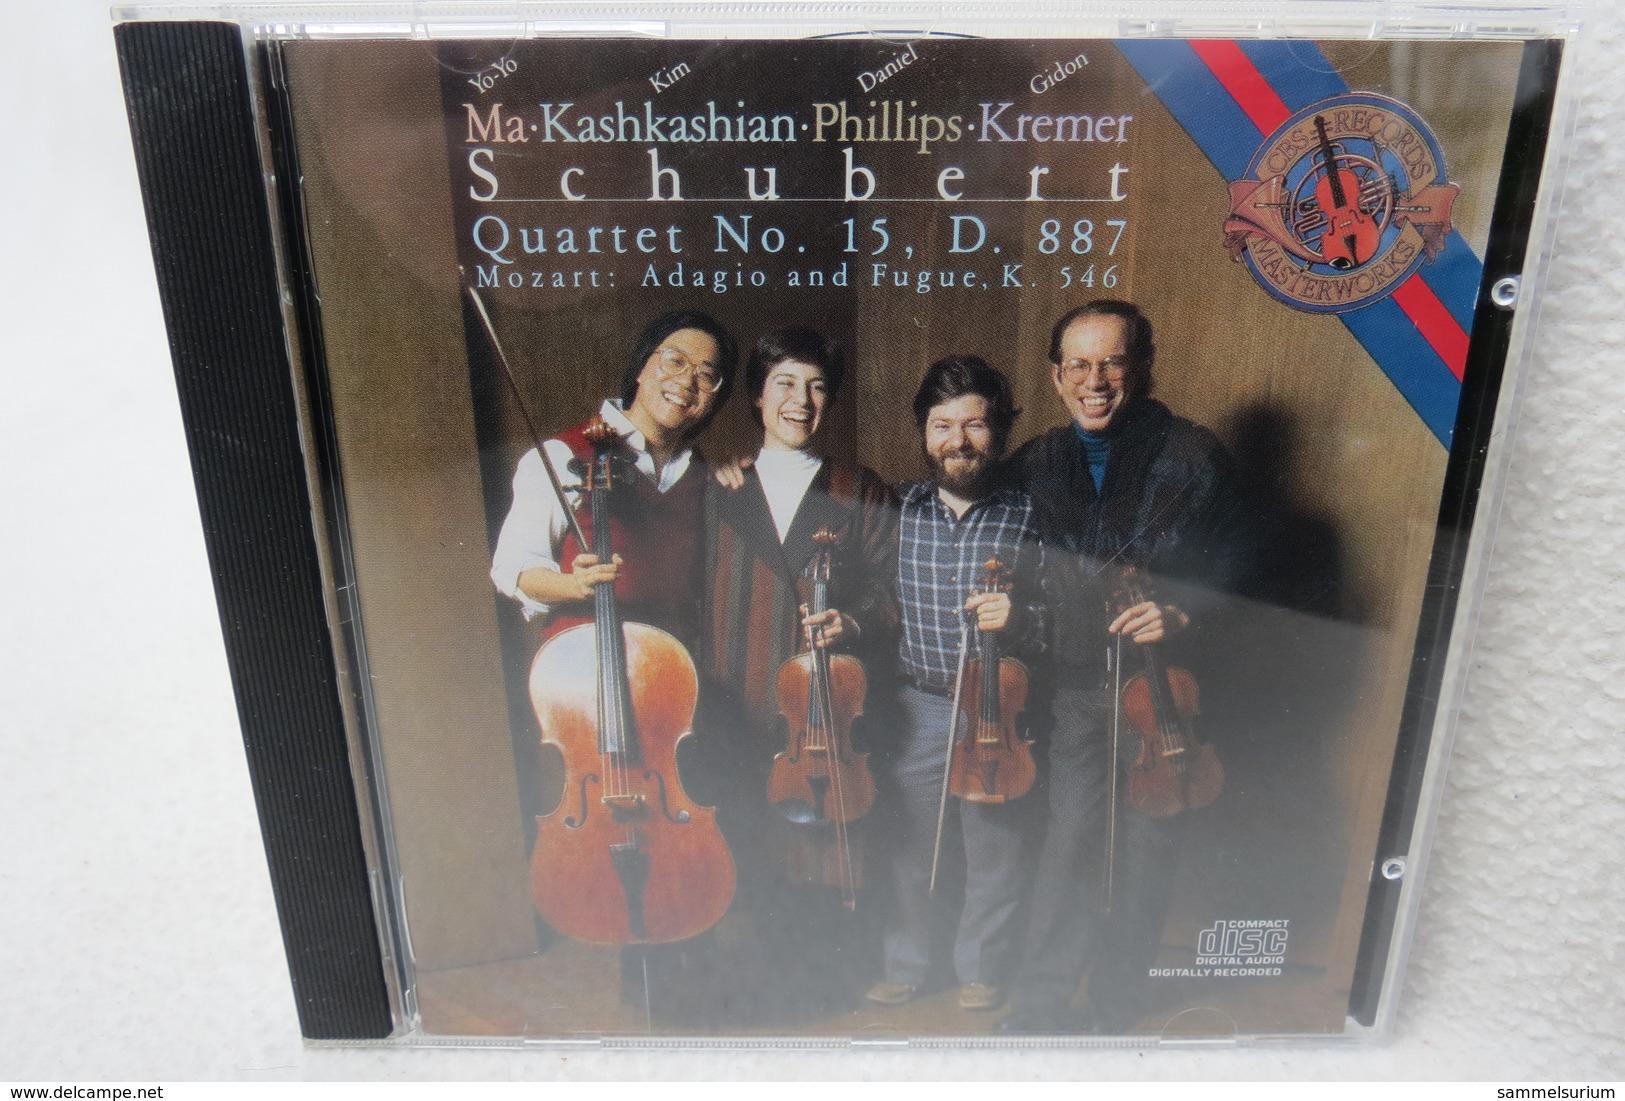 "CD ""Ma-Kashkashian-Phillips-Kremer"" Schubert Quartet No. 15, D. 887, Mozart: Adagio Und Fugue. K. 546 - Klassik"